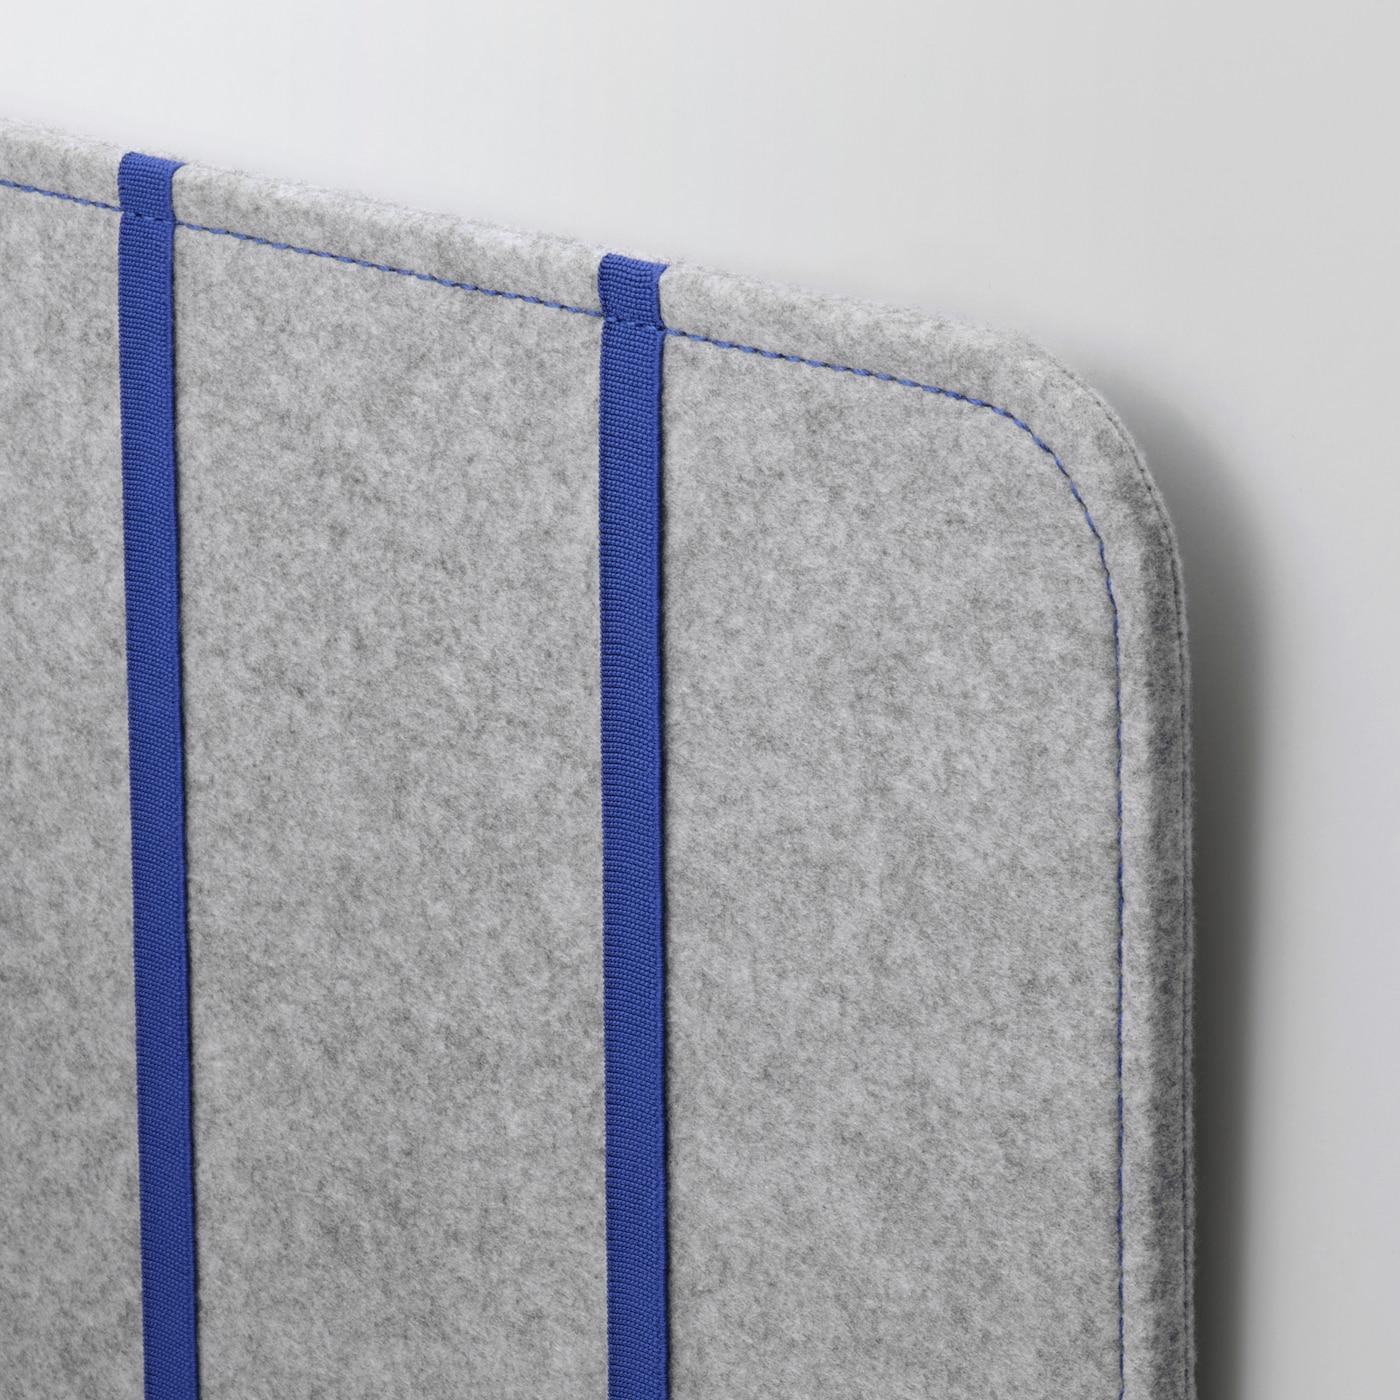 ÖVNING Desk divider with compartments